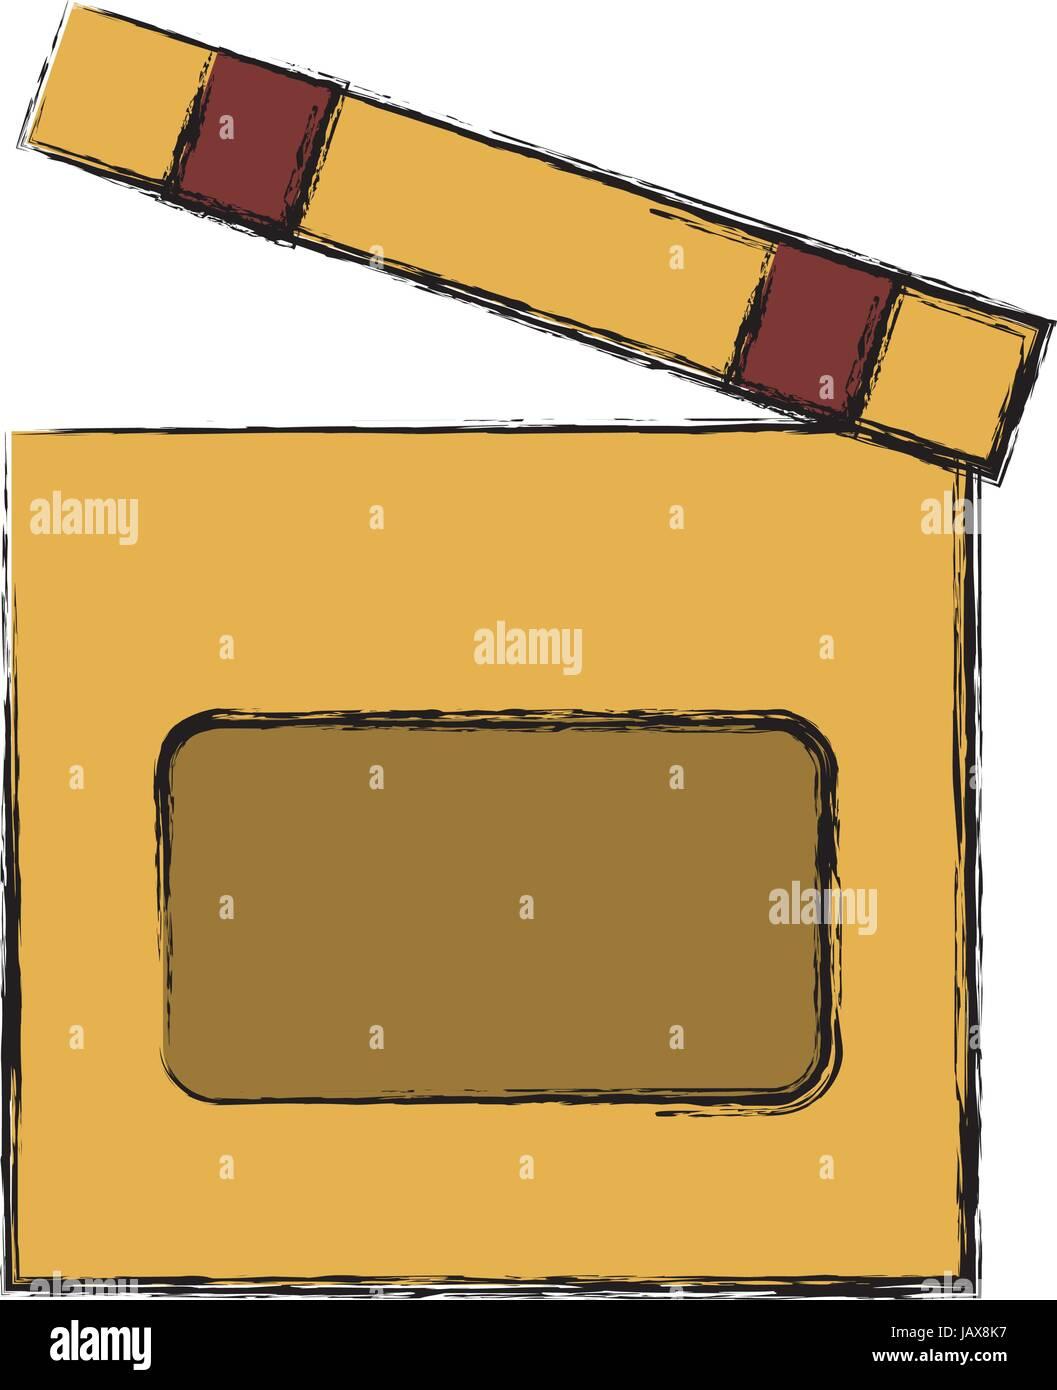 clapboard icon image stock vector art illustration vector image